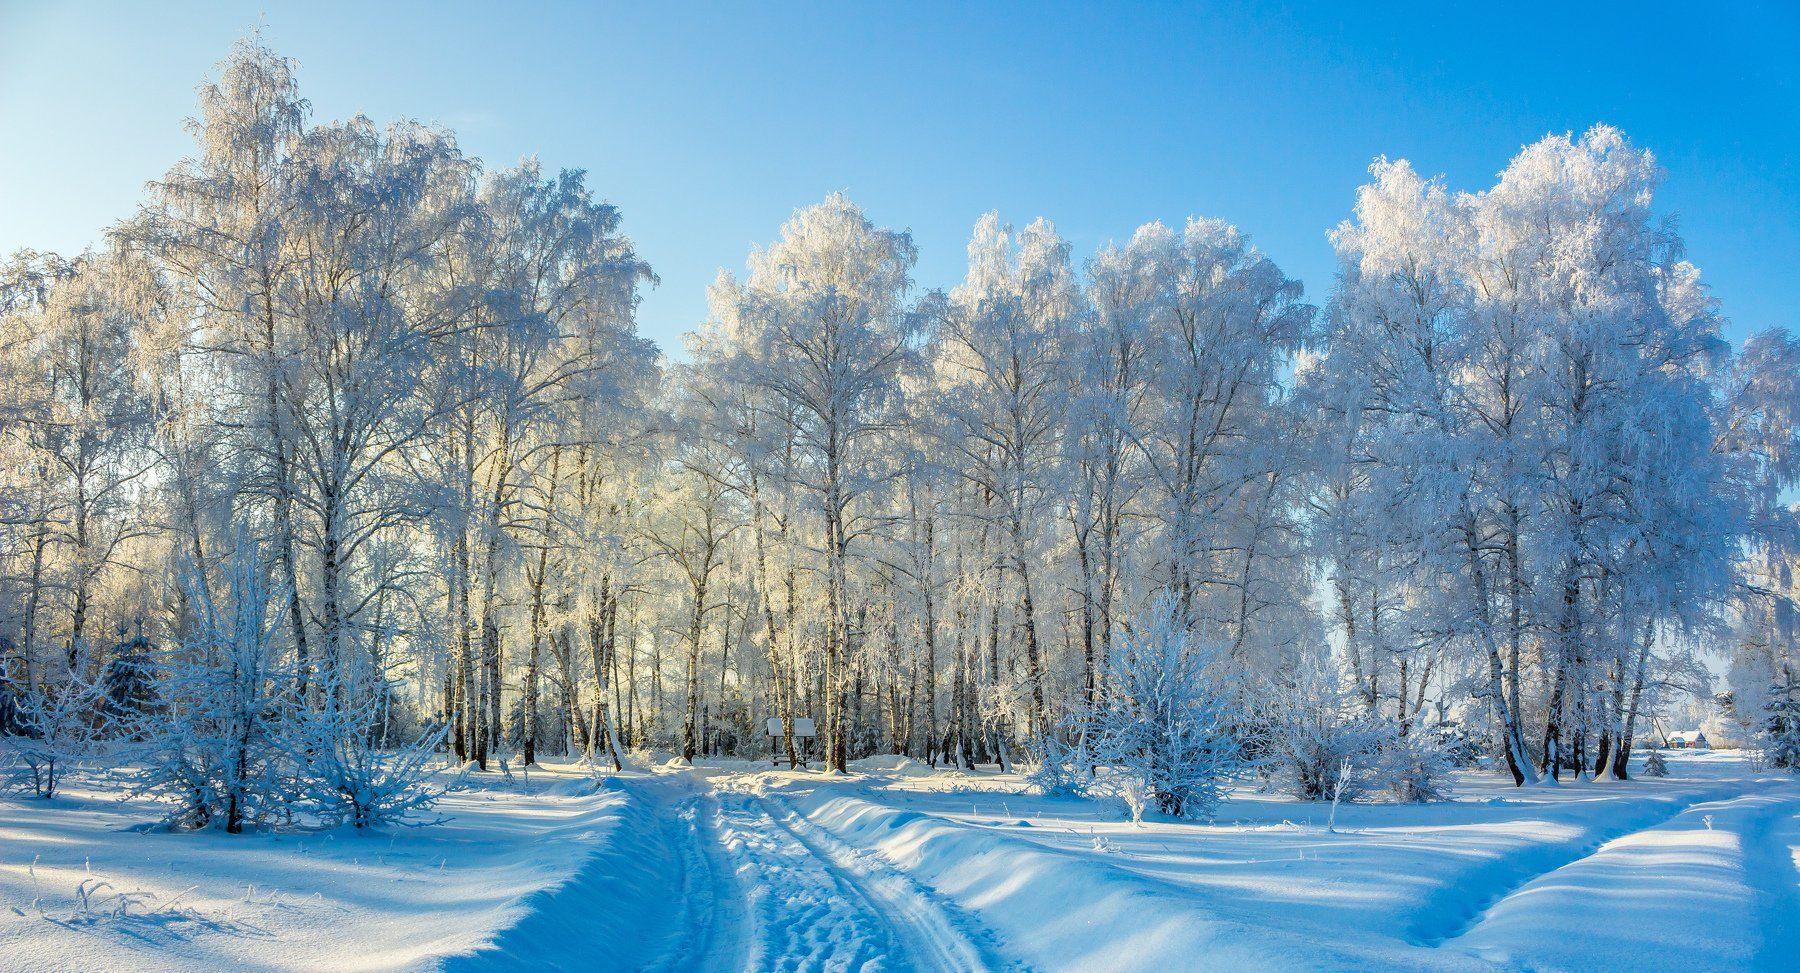 рождество, мороз, лес, иней, зима, дорога, деревня, беседка, Руслан Востриков